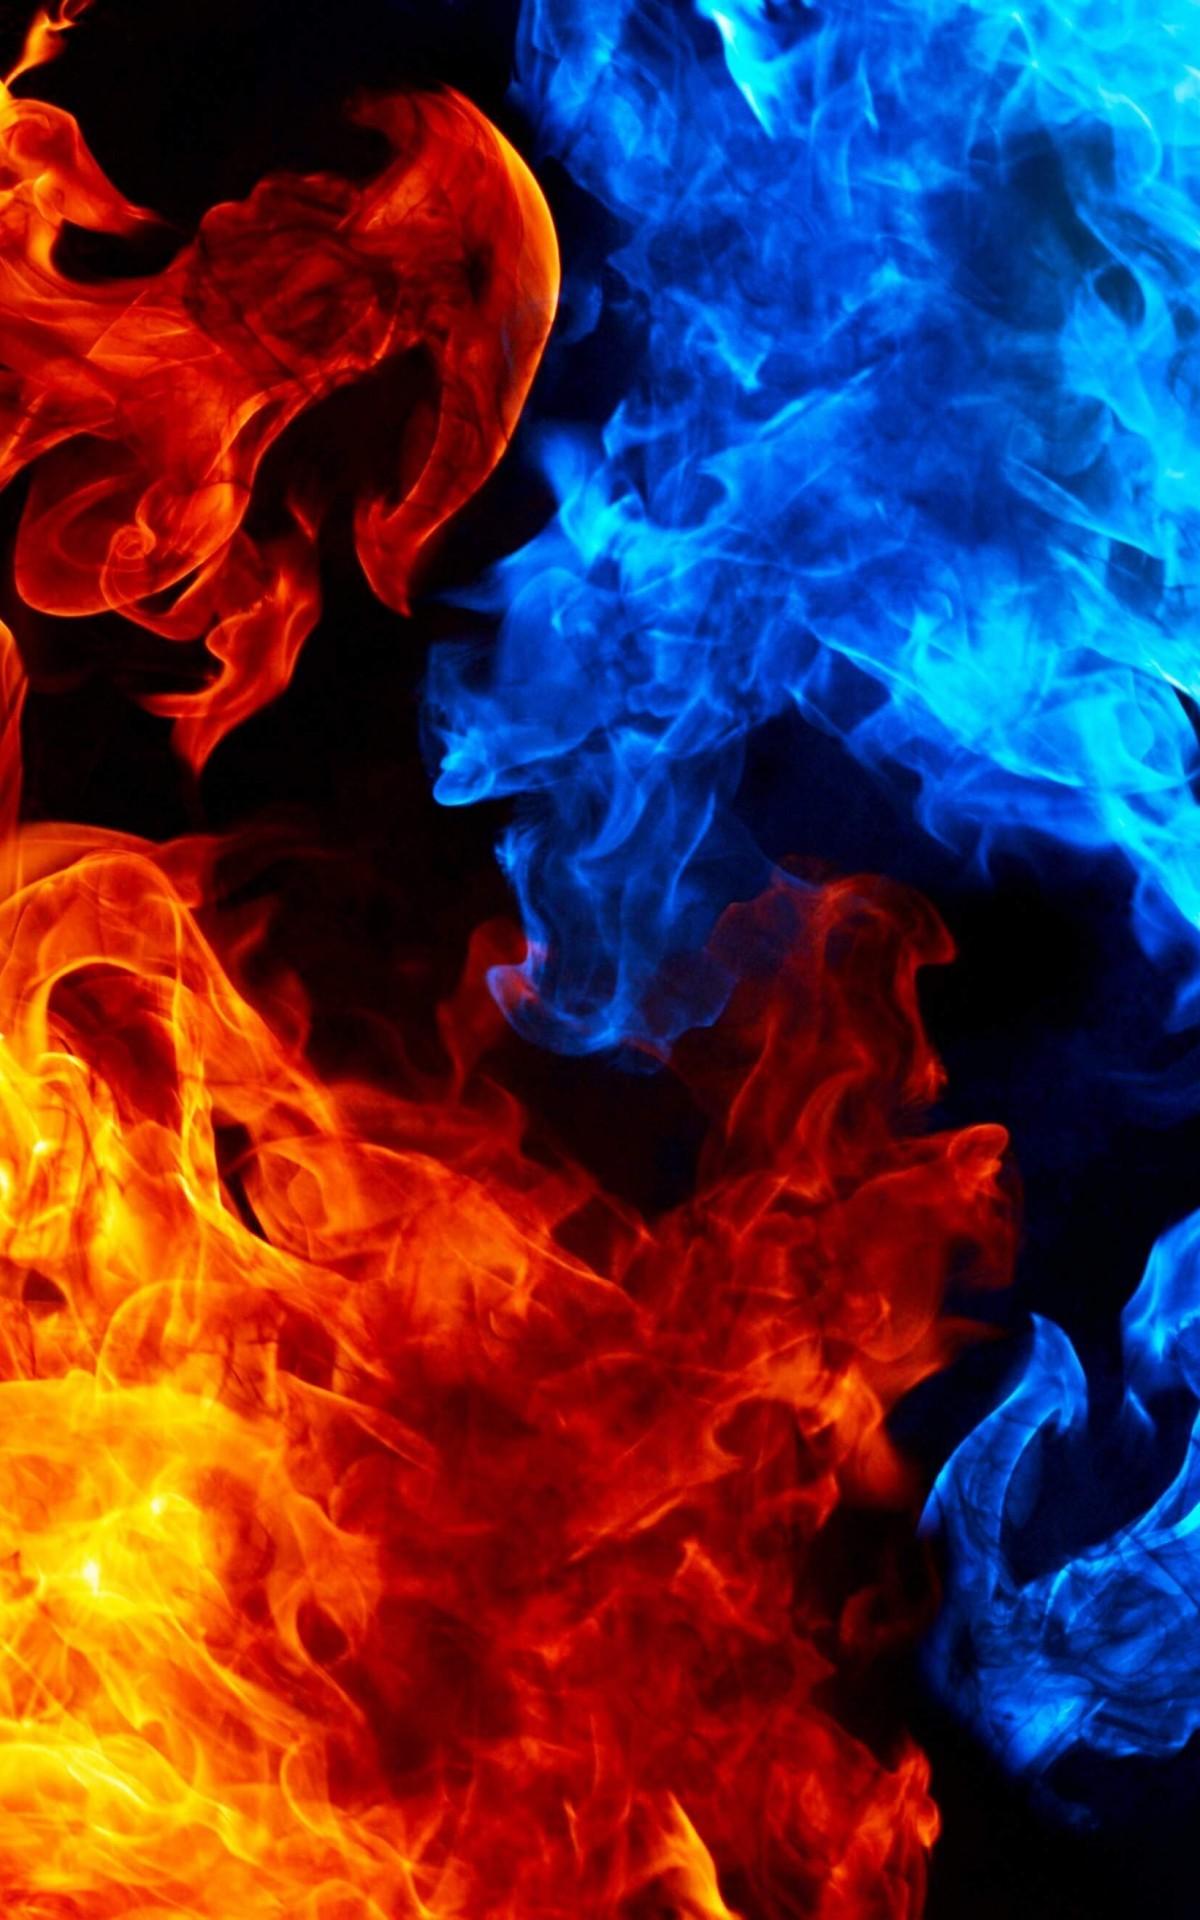 Fire Wallpaper Hd ① Wallpapertag